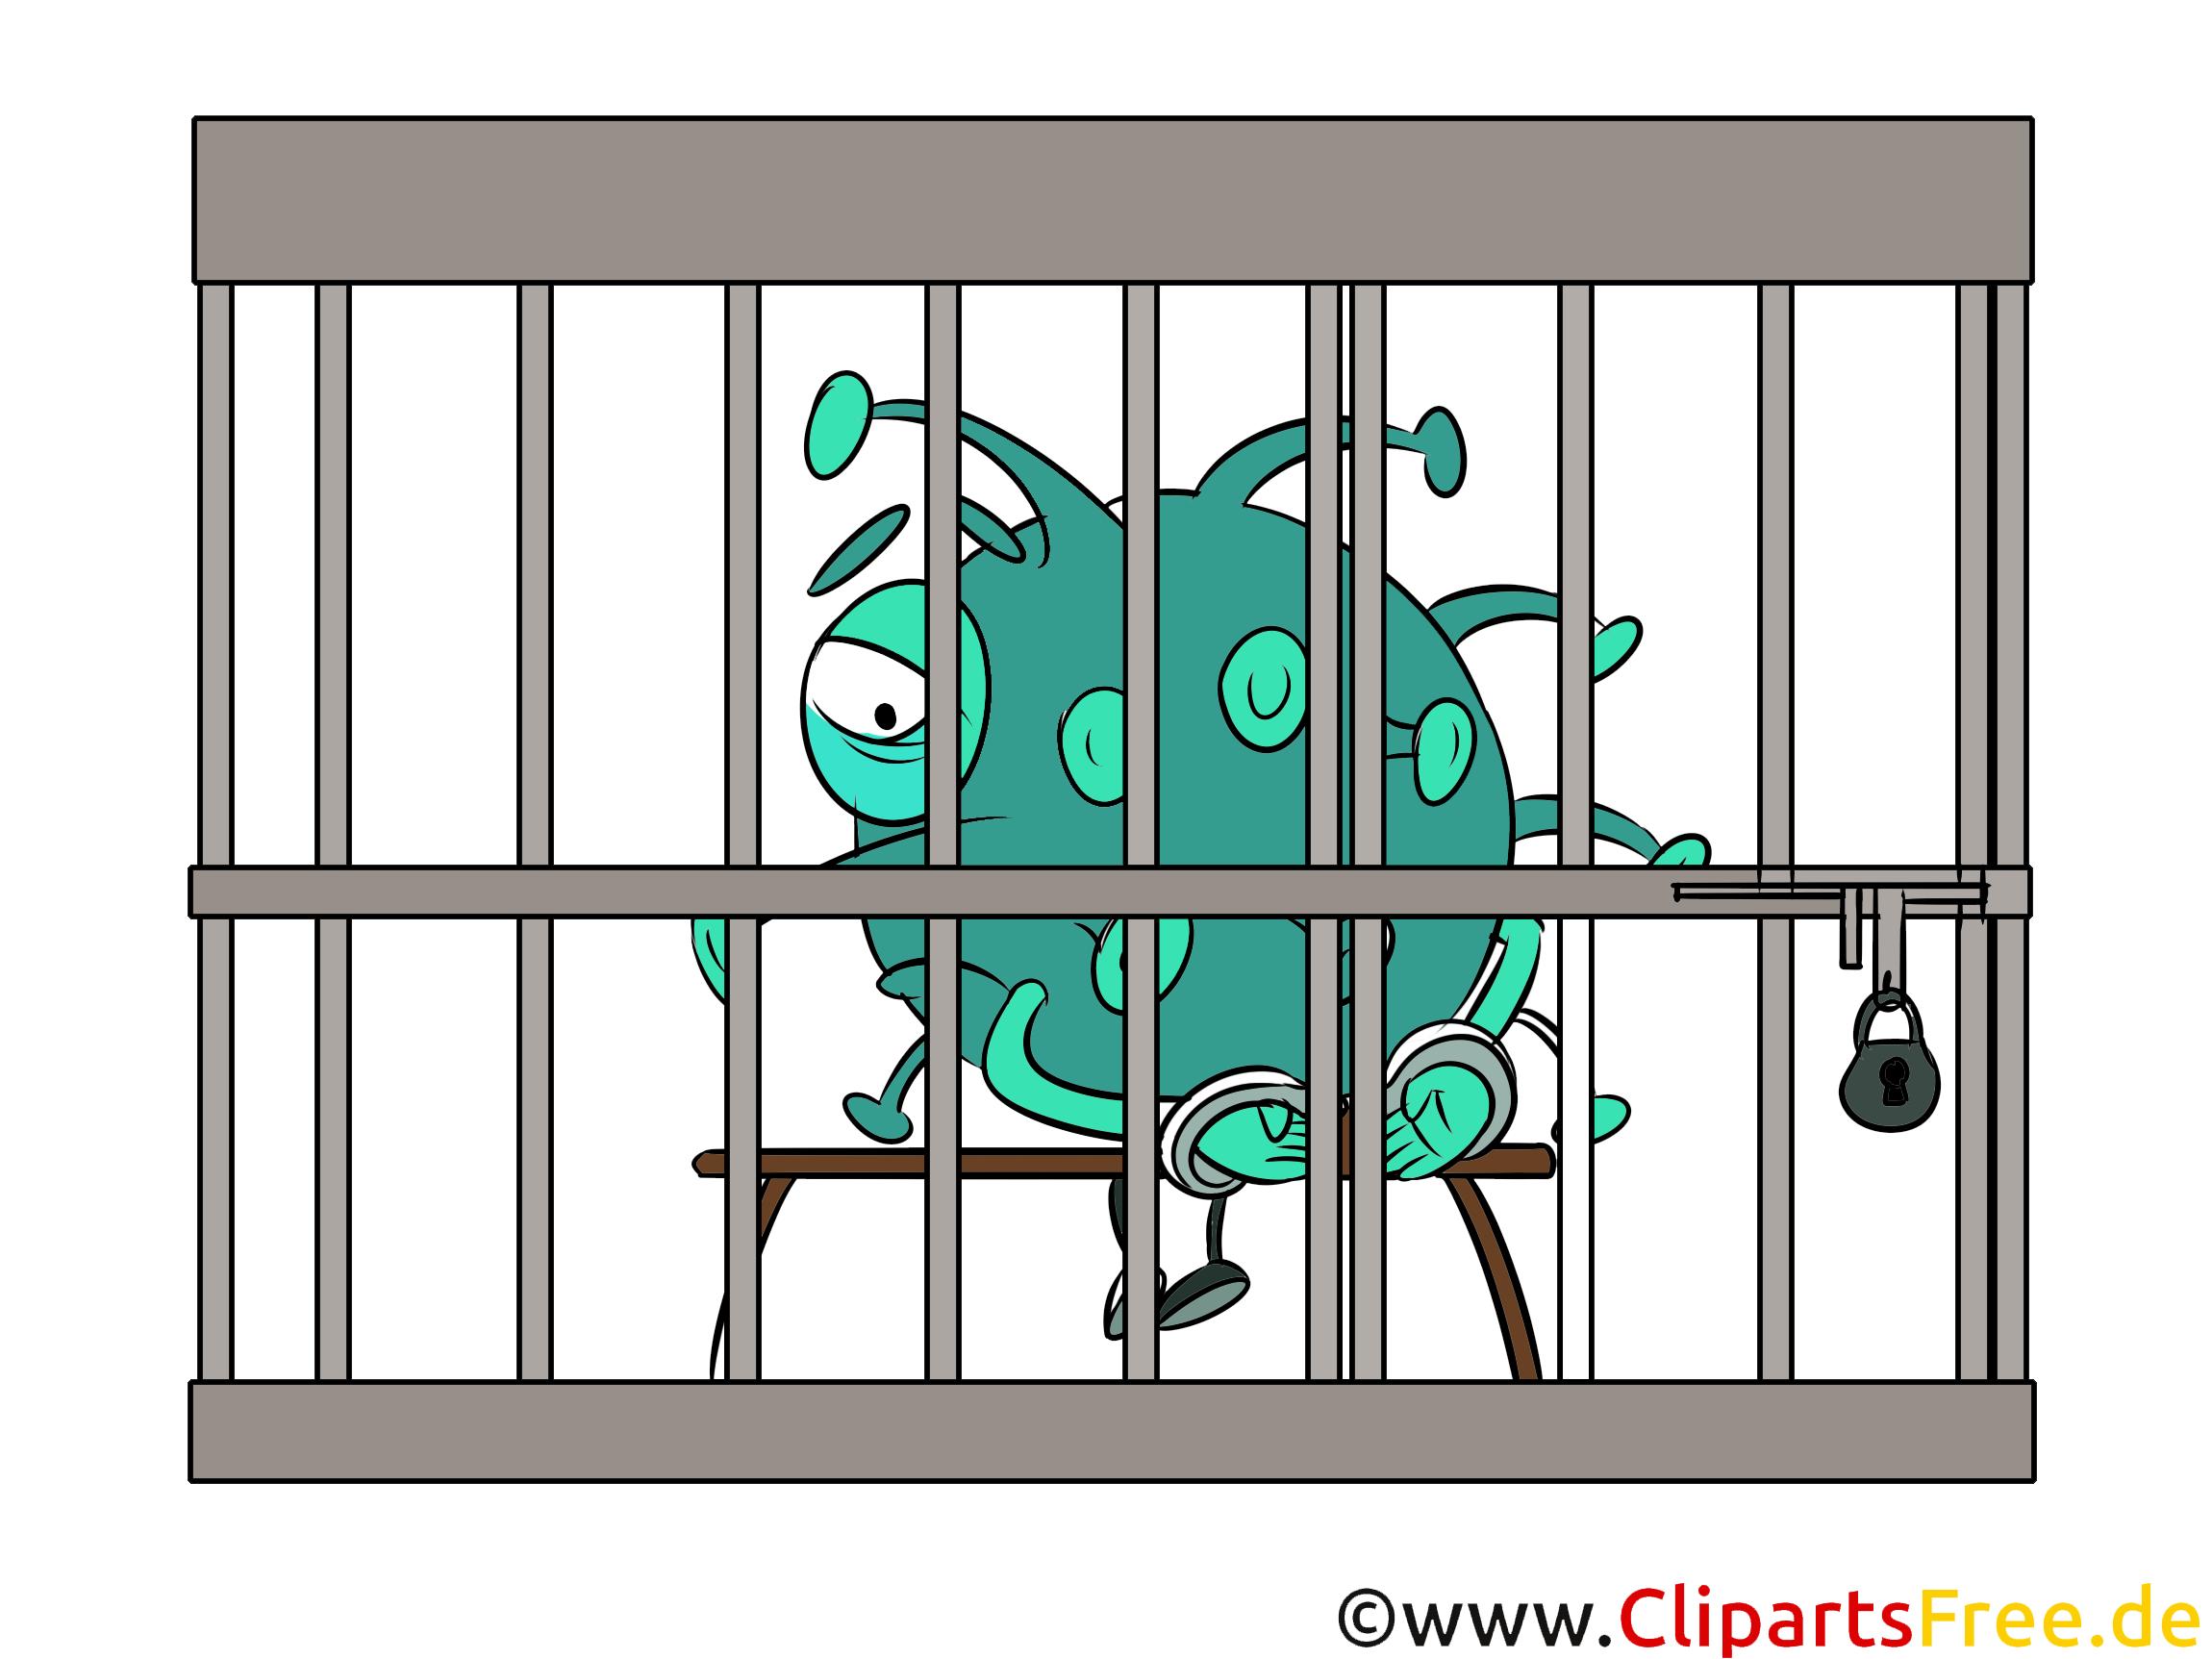 Bakterie isoliert im Käfig Bild, Clipart, Comic